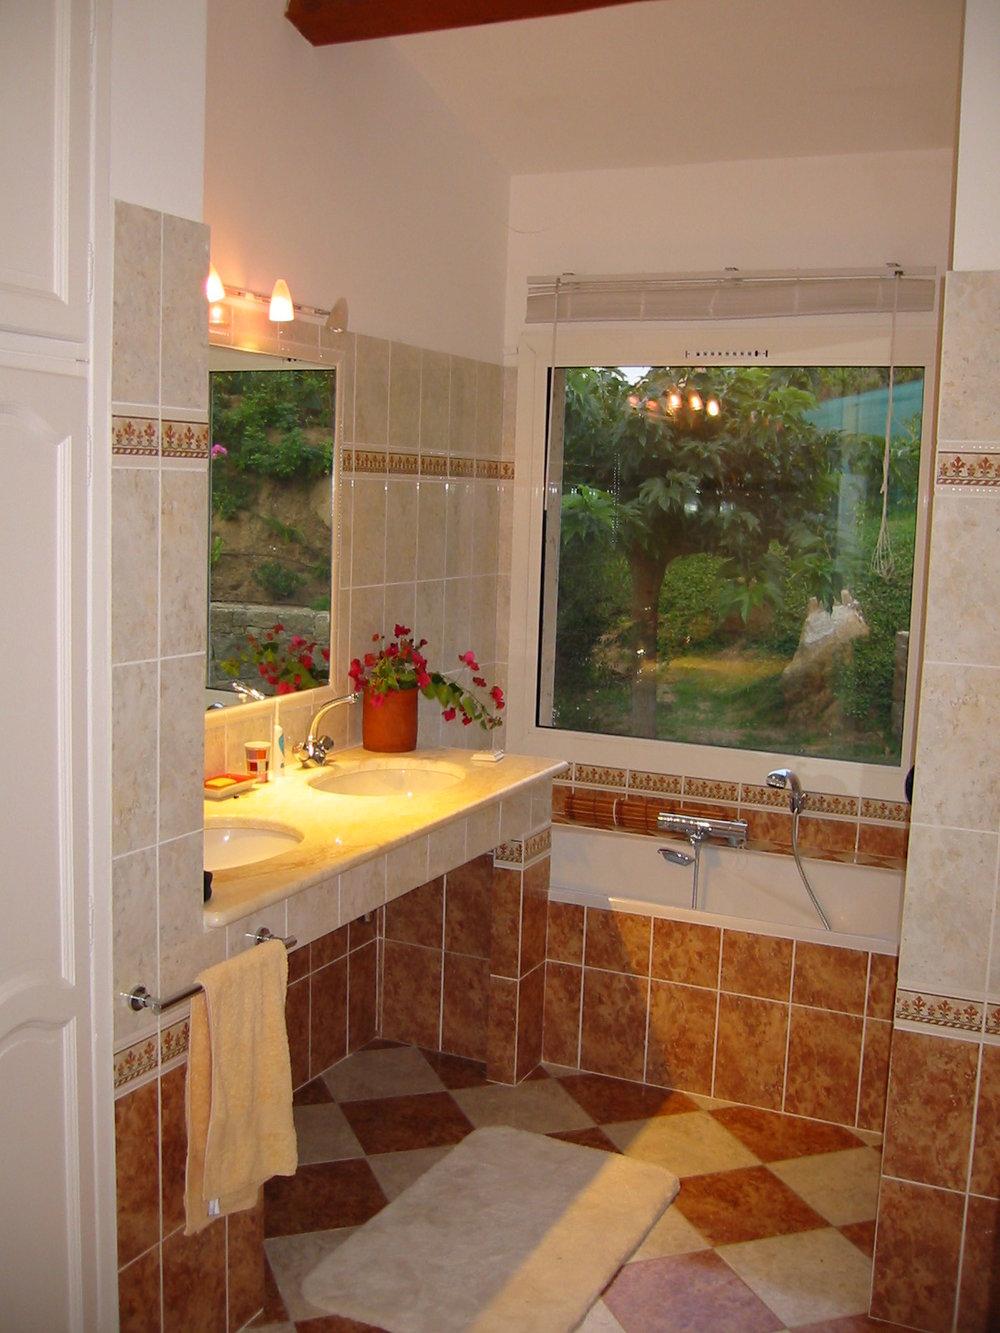 Salle de bain de maitre